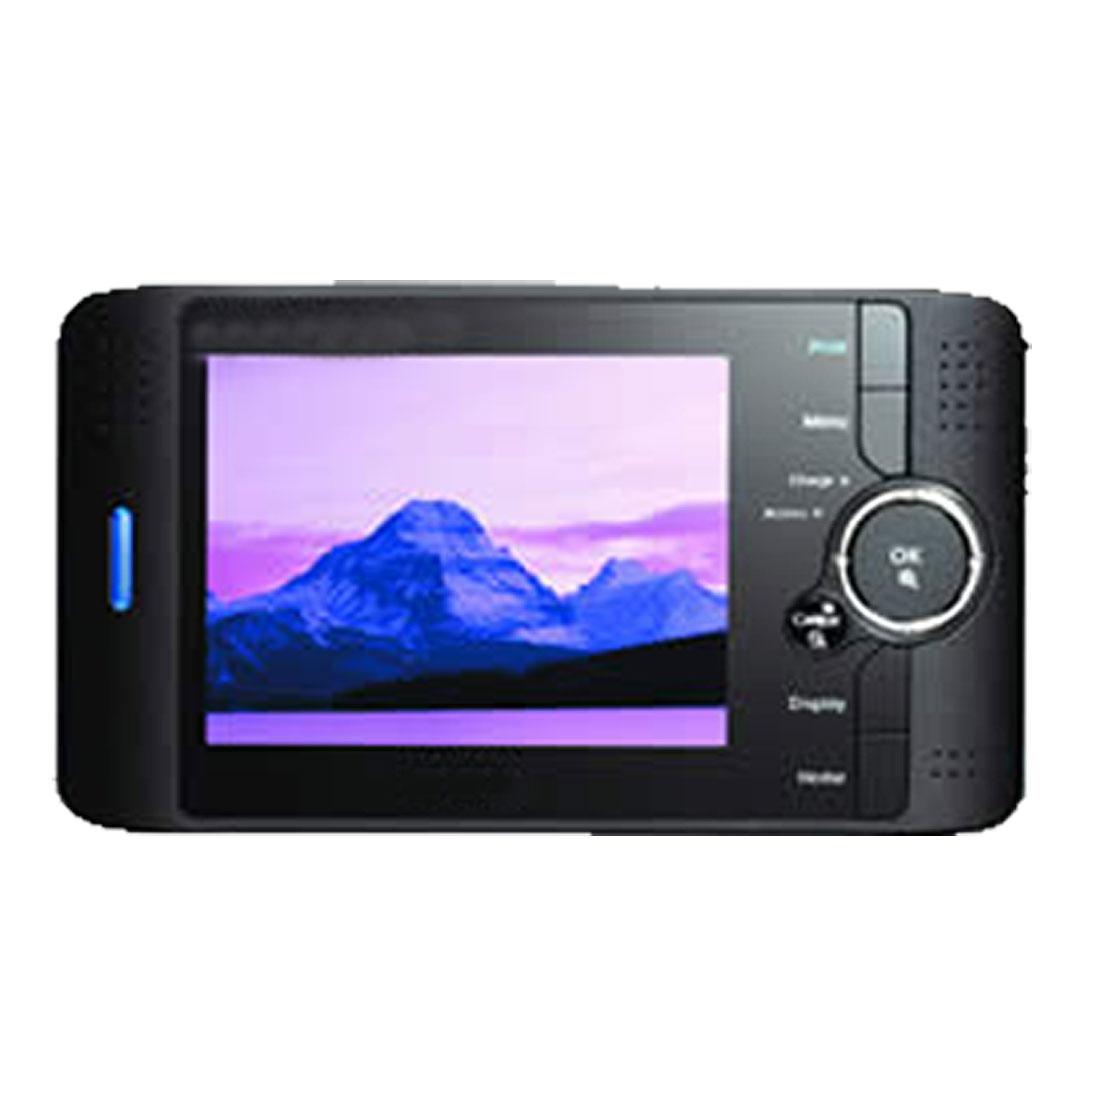 "2 Pcs Transparent 3.8"" LCD Screen Guard Film for MP4 Camera Phone"